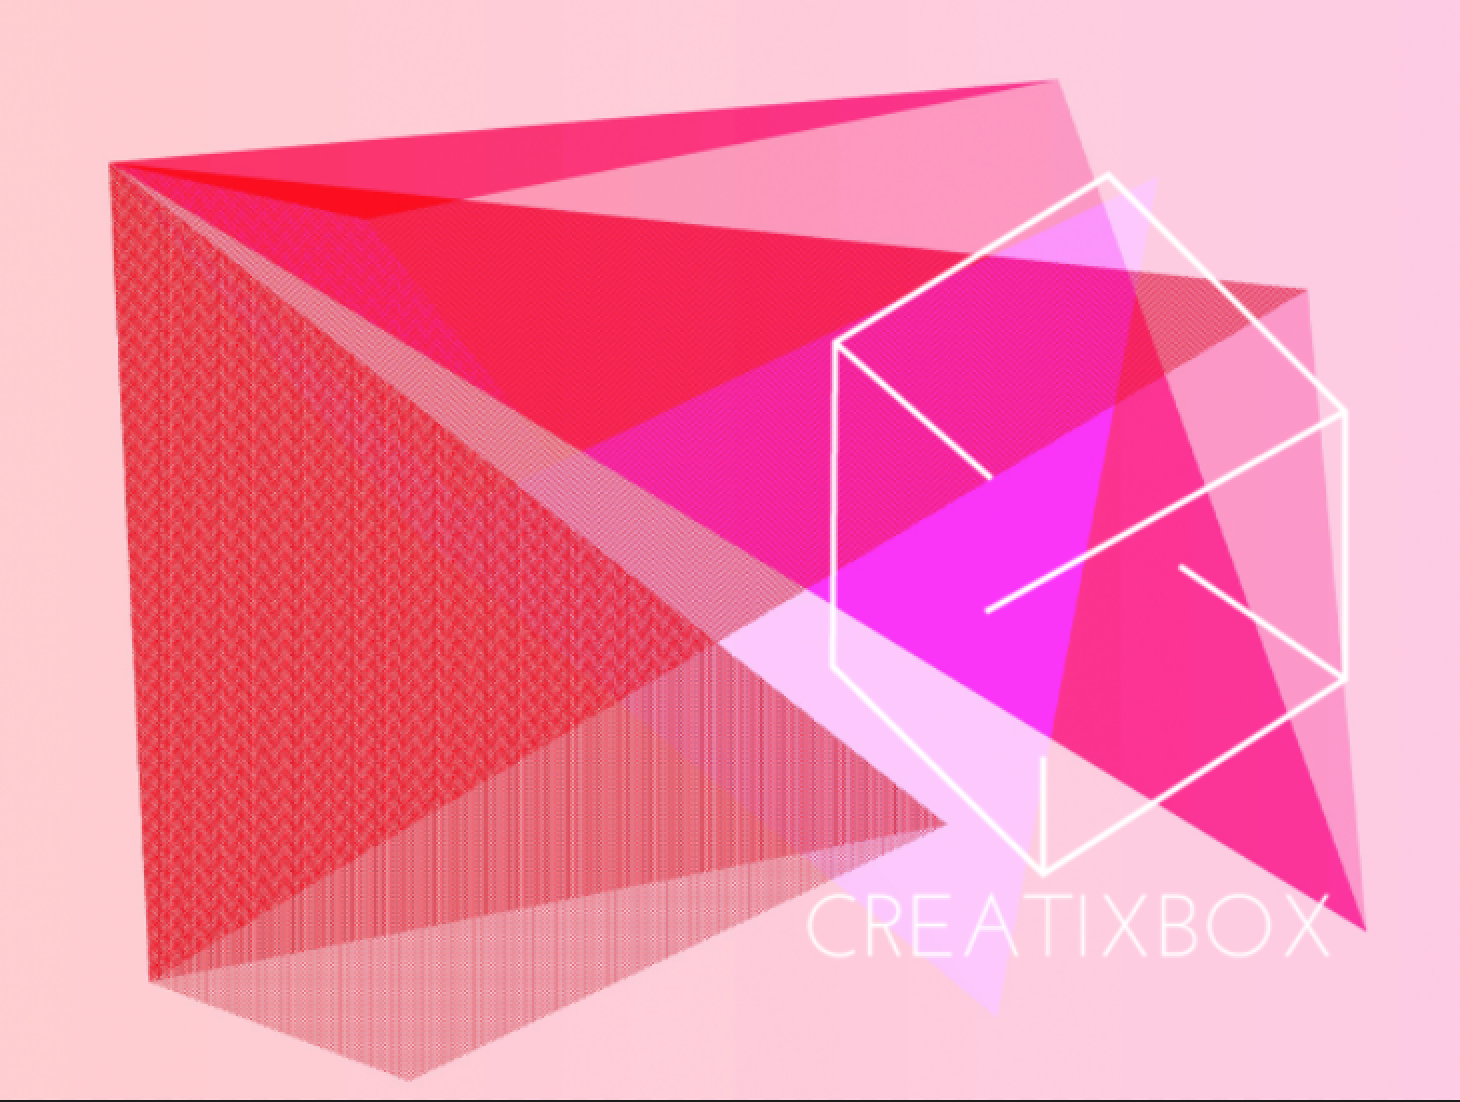 CreatixBox Red.png